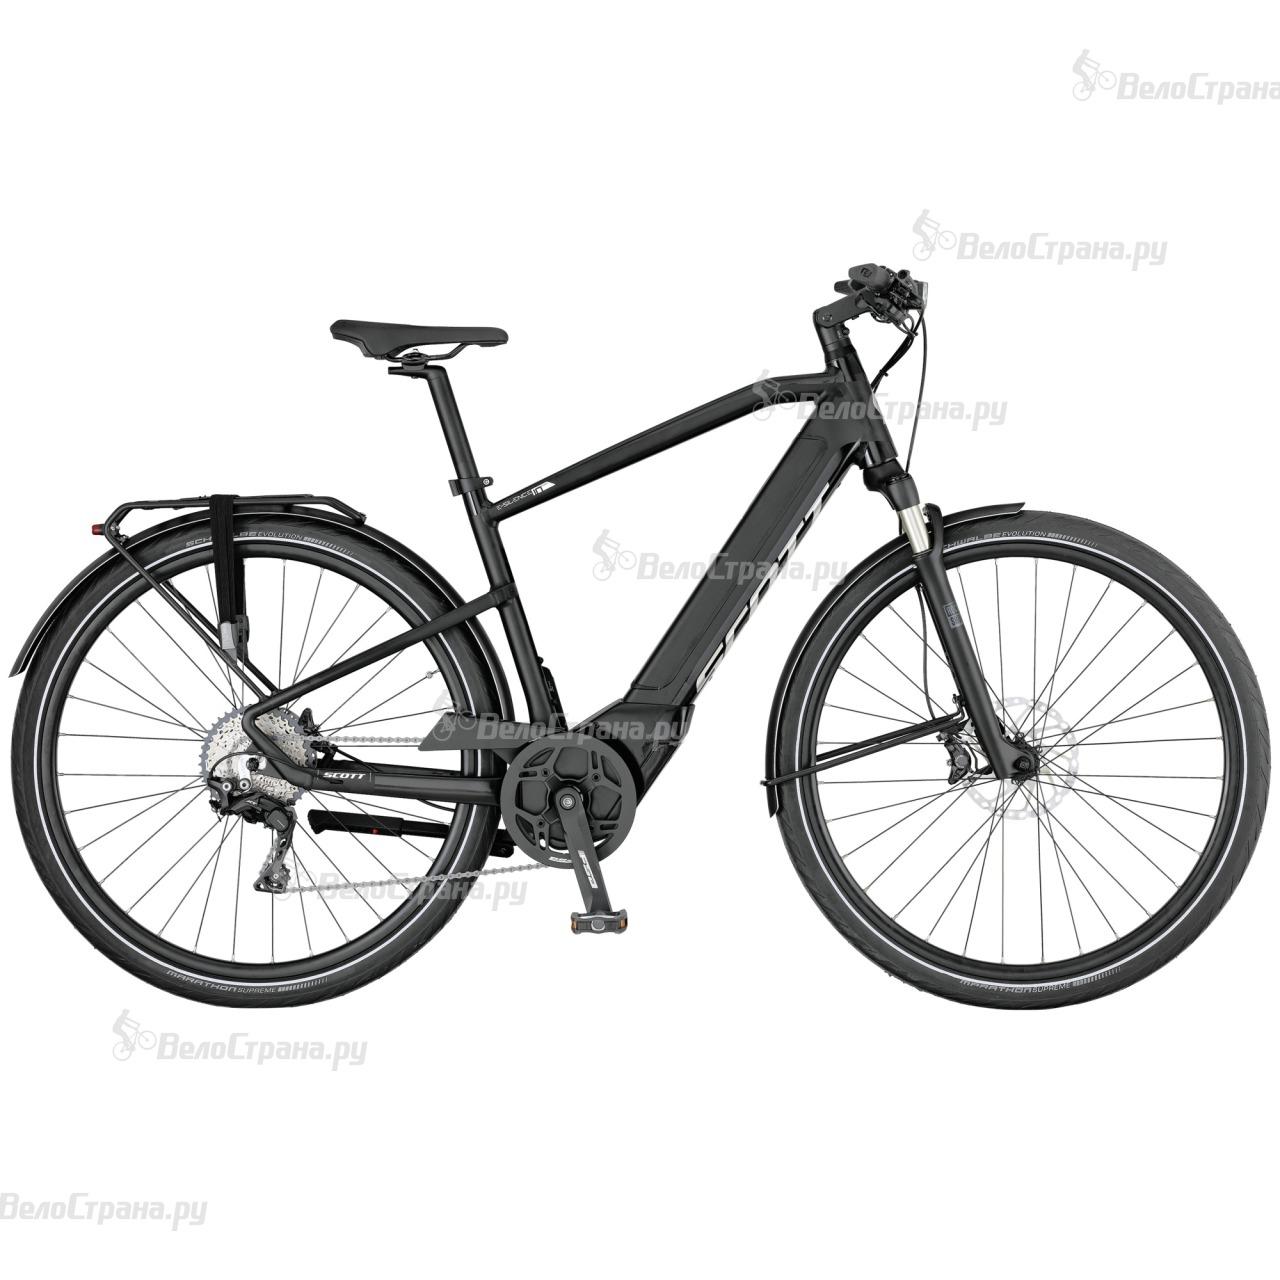 Велосипед Scott E-Silence 10 (2017) велосипед scott e silence evo 2017